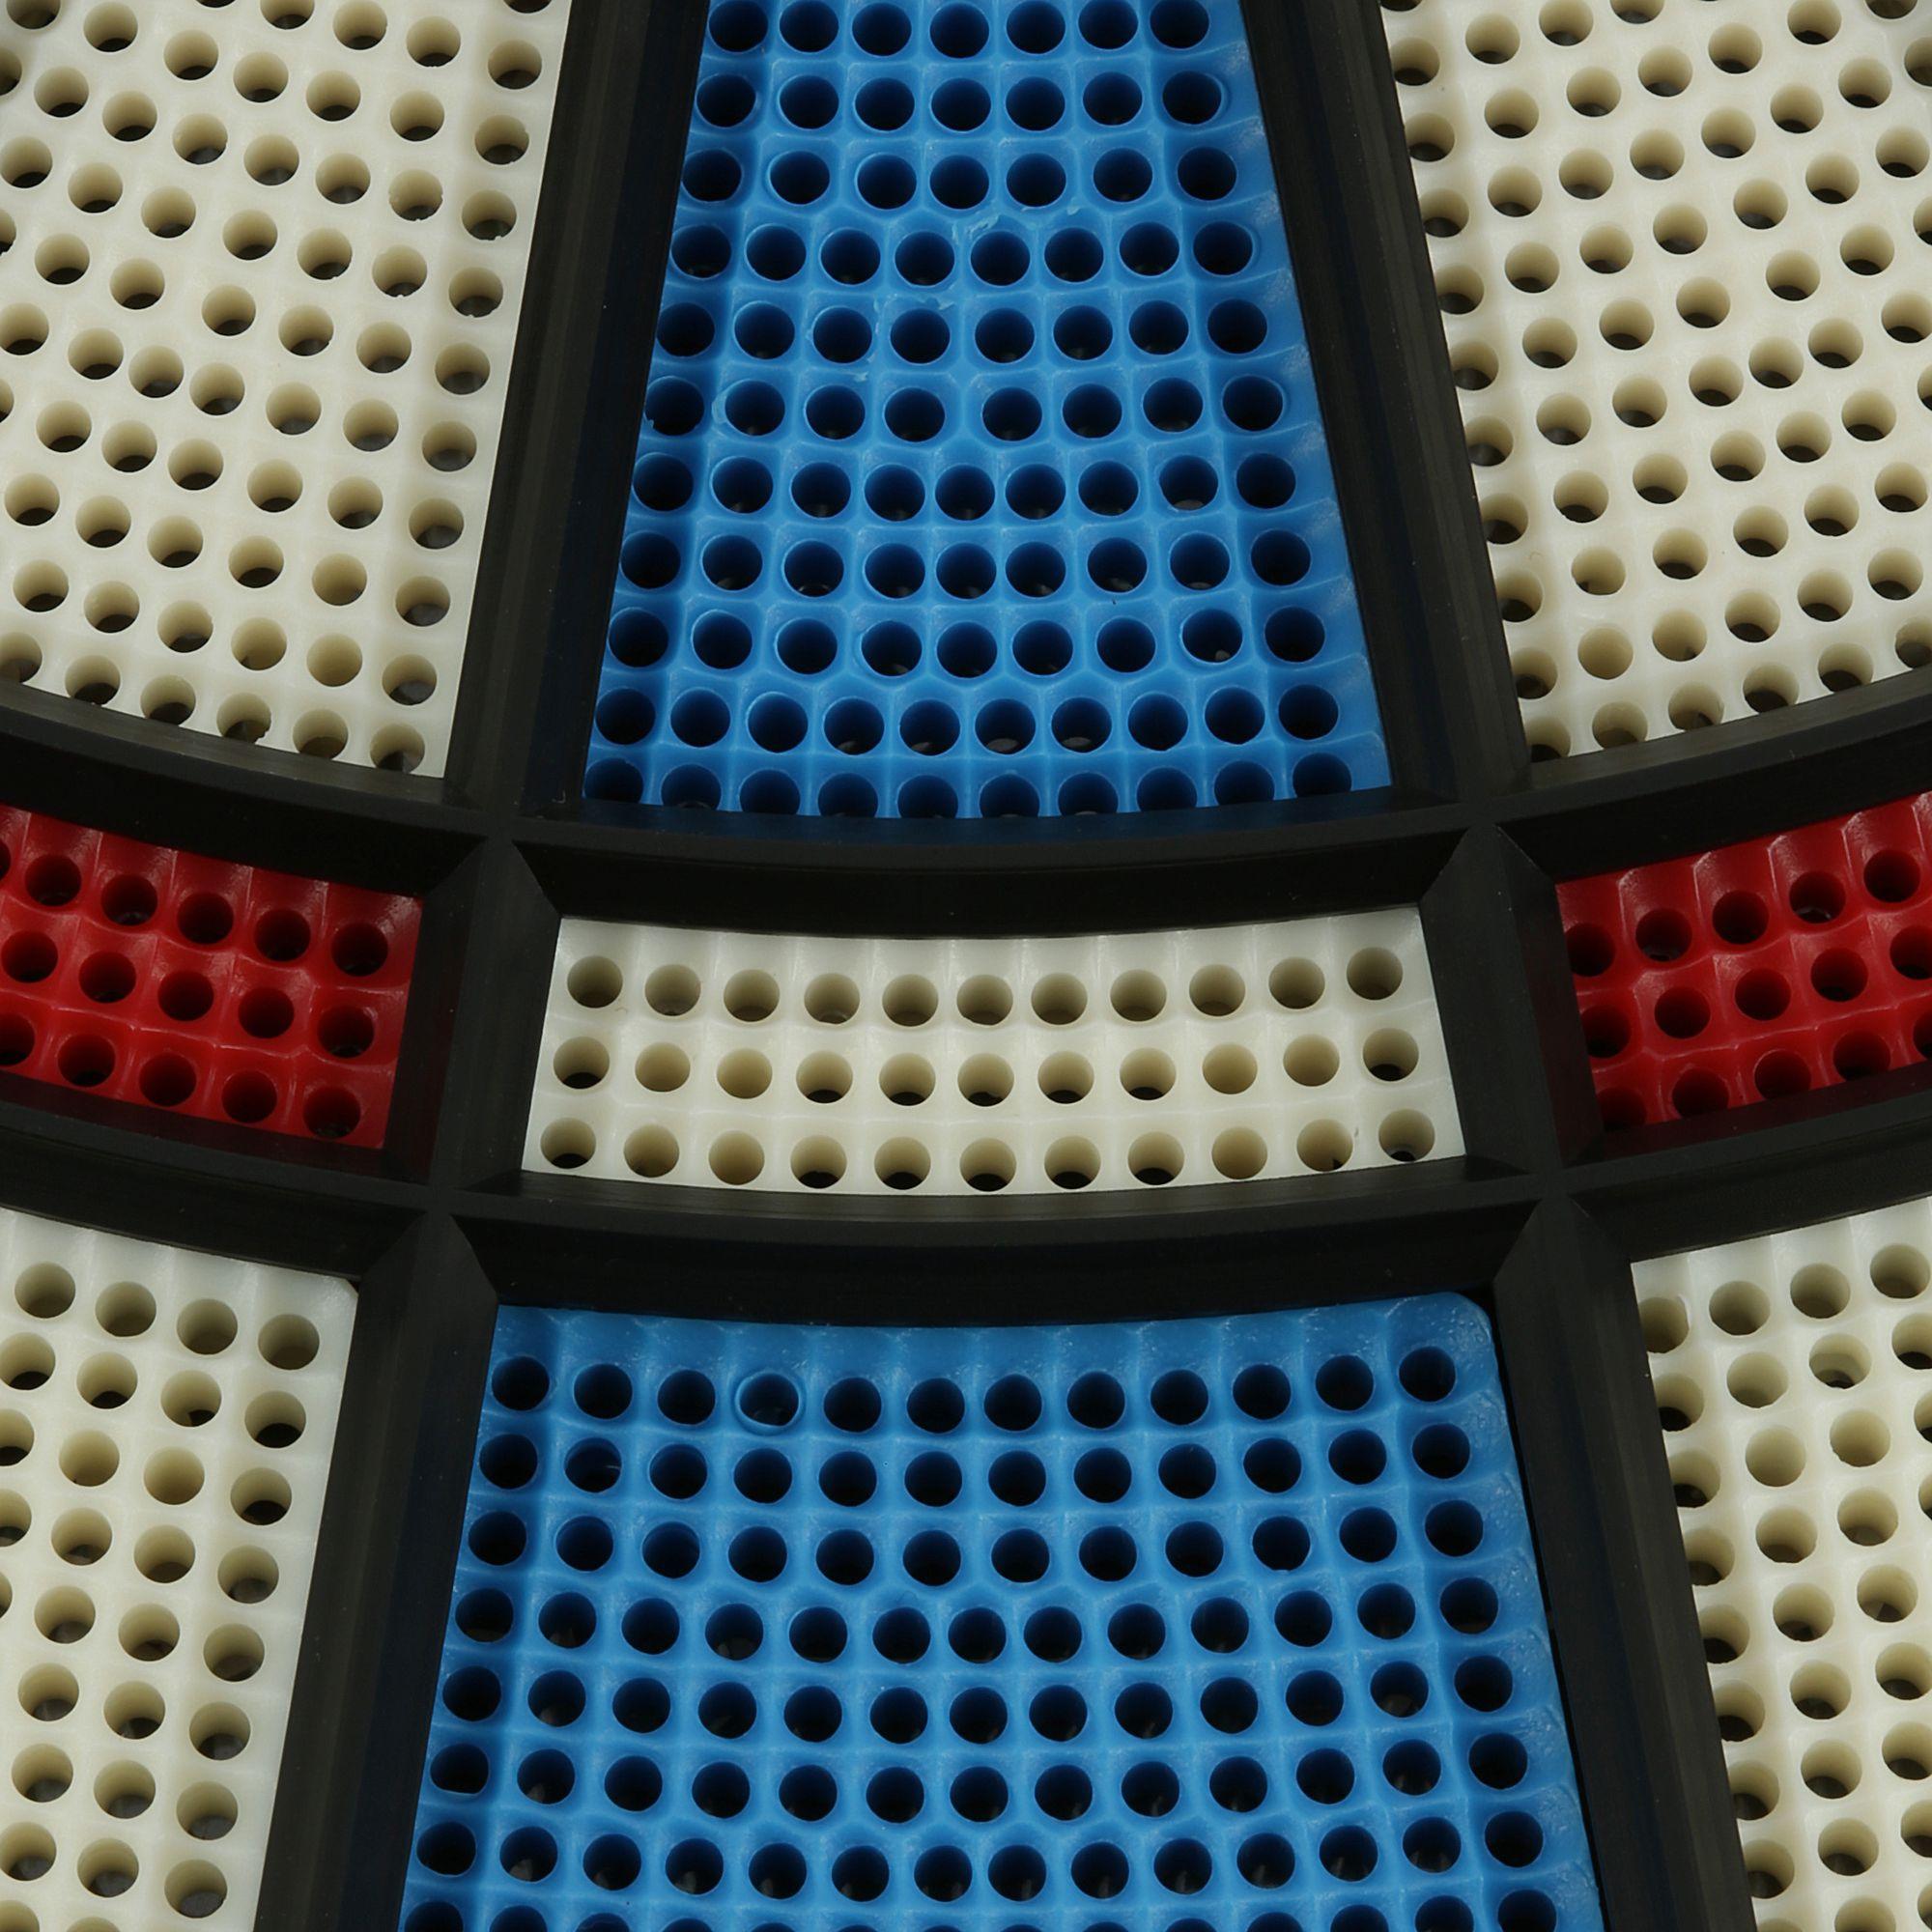 cible de fl chettes electronique ed110 clubs. Black Bedroom Furniture Sets. Home Design Ideas